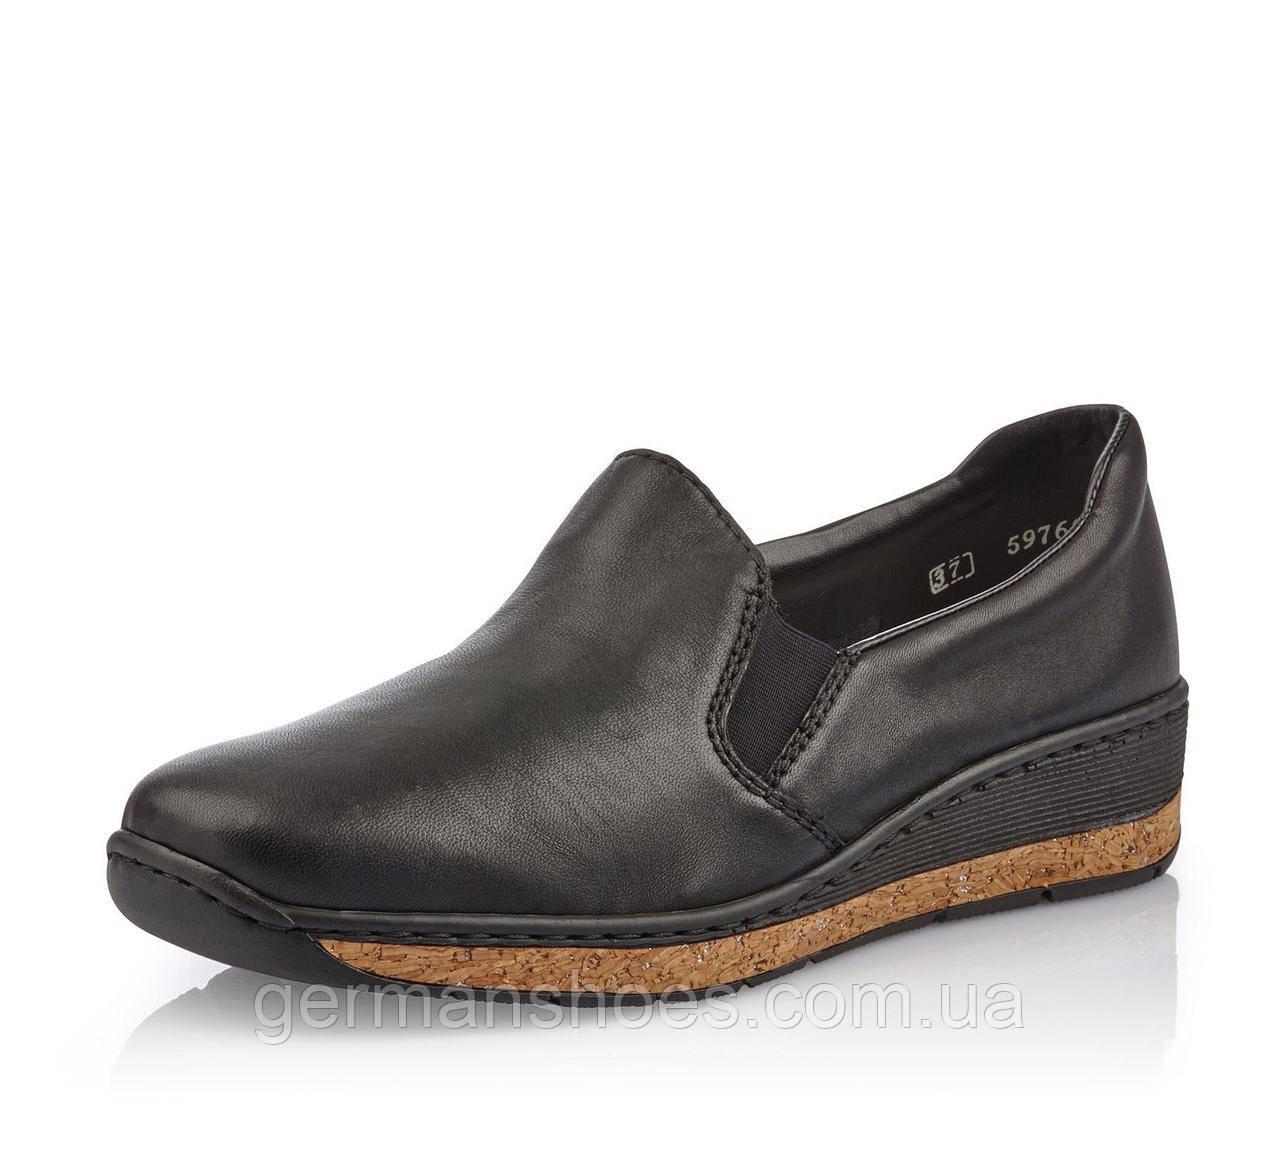 Туфли женские Rieker 59766-00